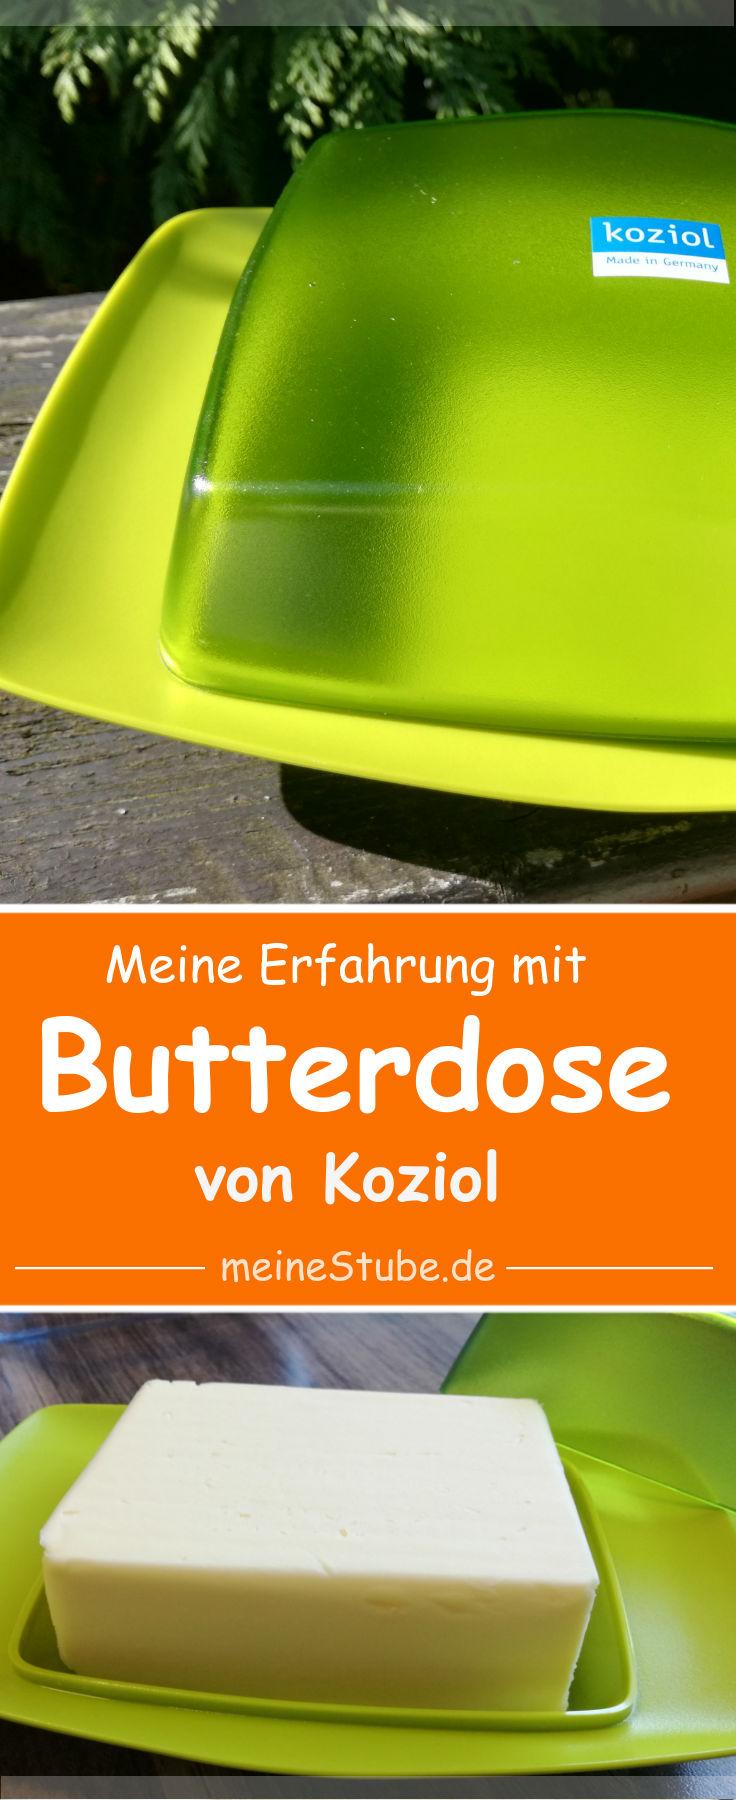 erfahrung-butterdose-koziol